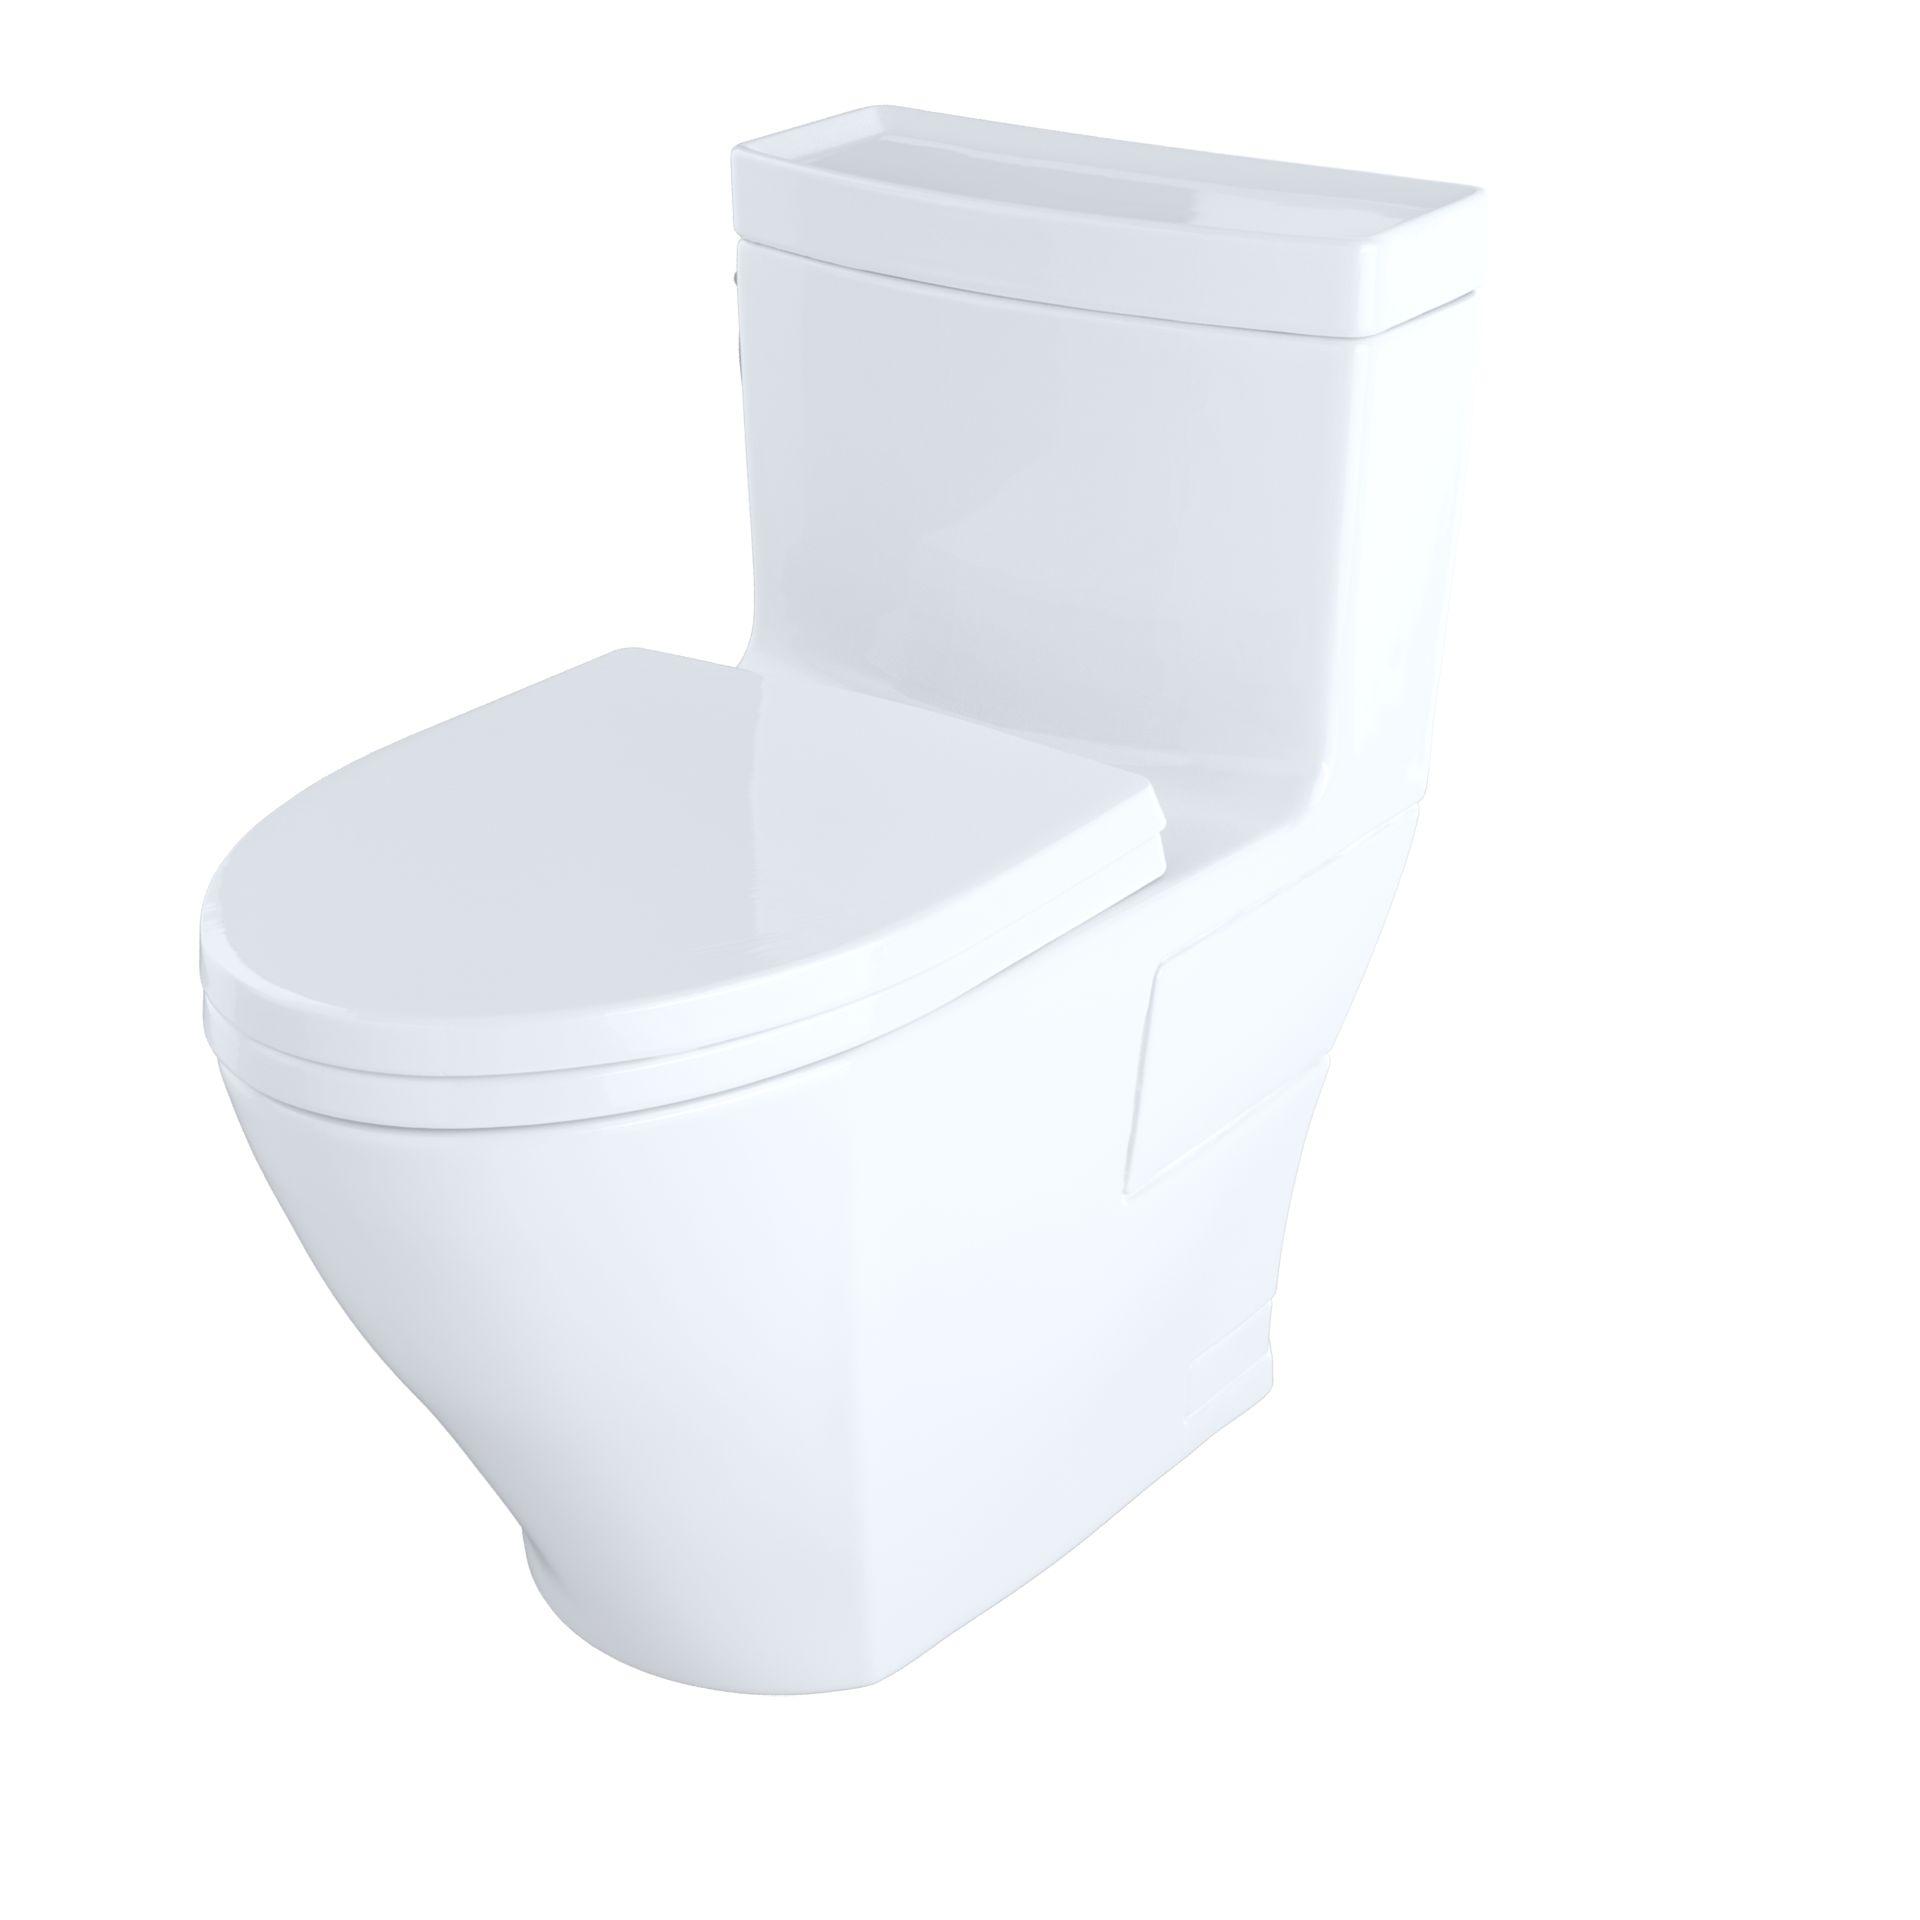 Aimes® One-Piece Toilet, 1.28GPF, Elongated Bowl - Washlet®+ ...